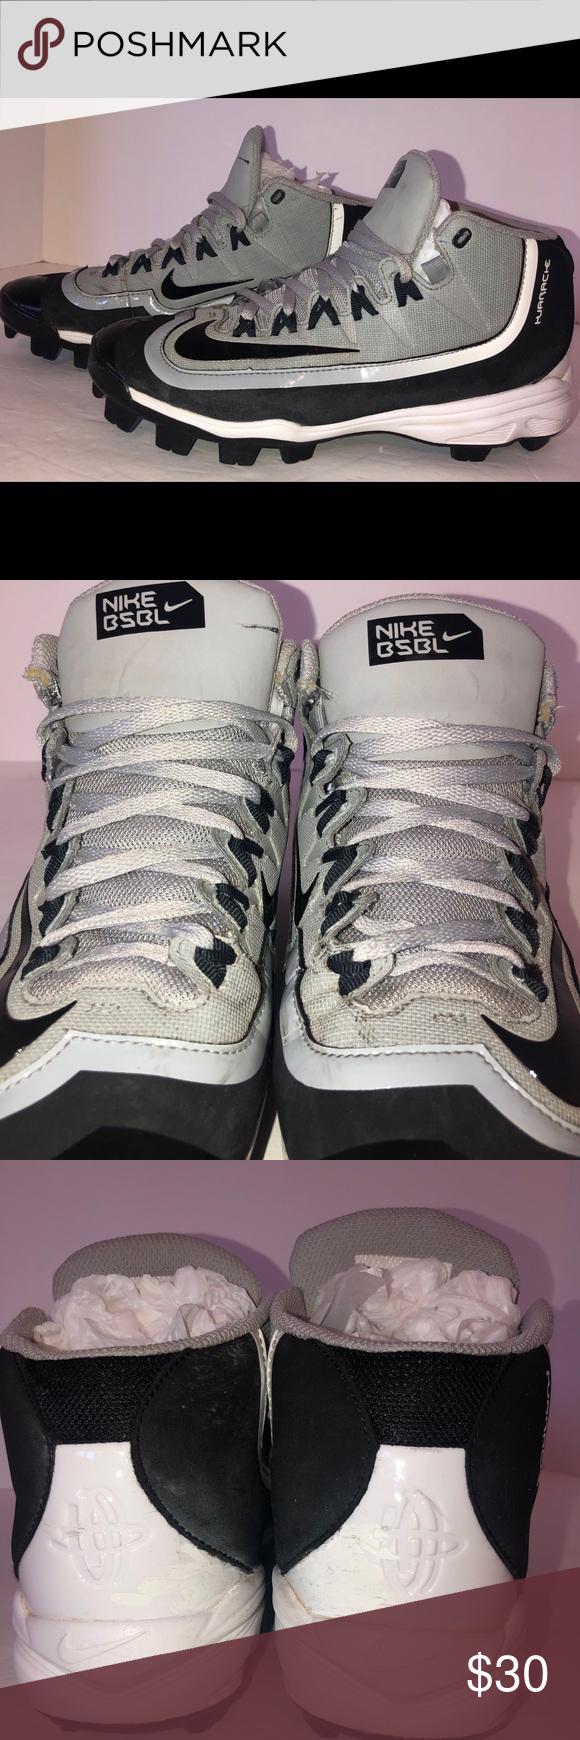 e279cadb8 Mens Nike Gray Huaraches Baseball Cleats Size 7 Mens Nike Huarache 2K Filth  ProMid MCS Baseball